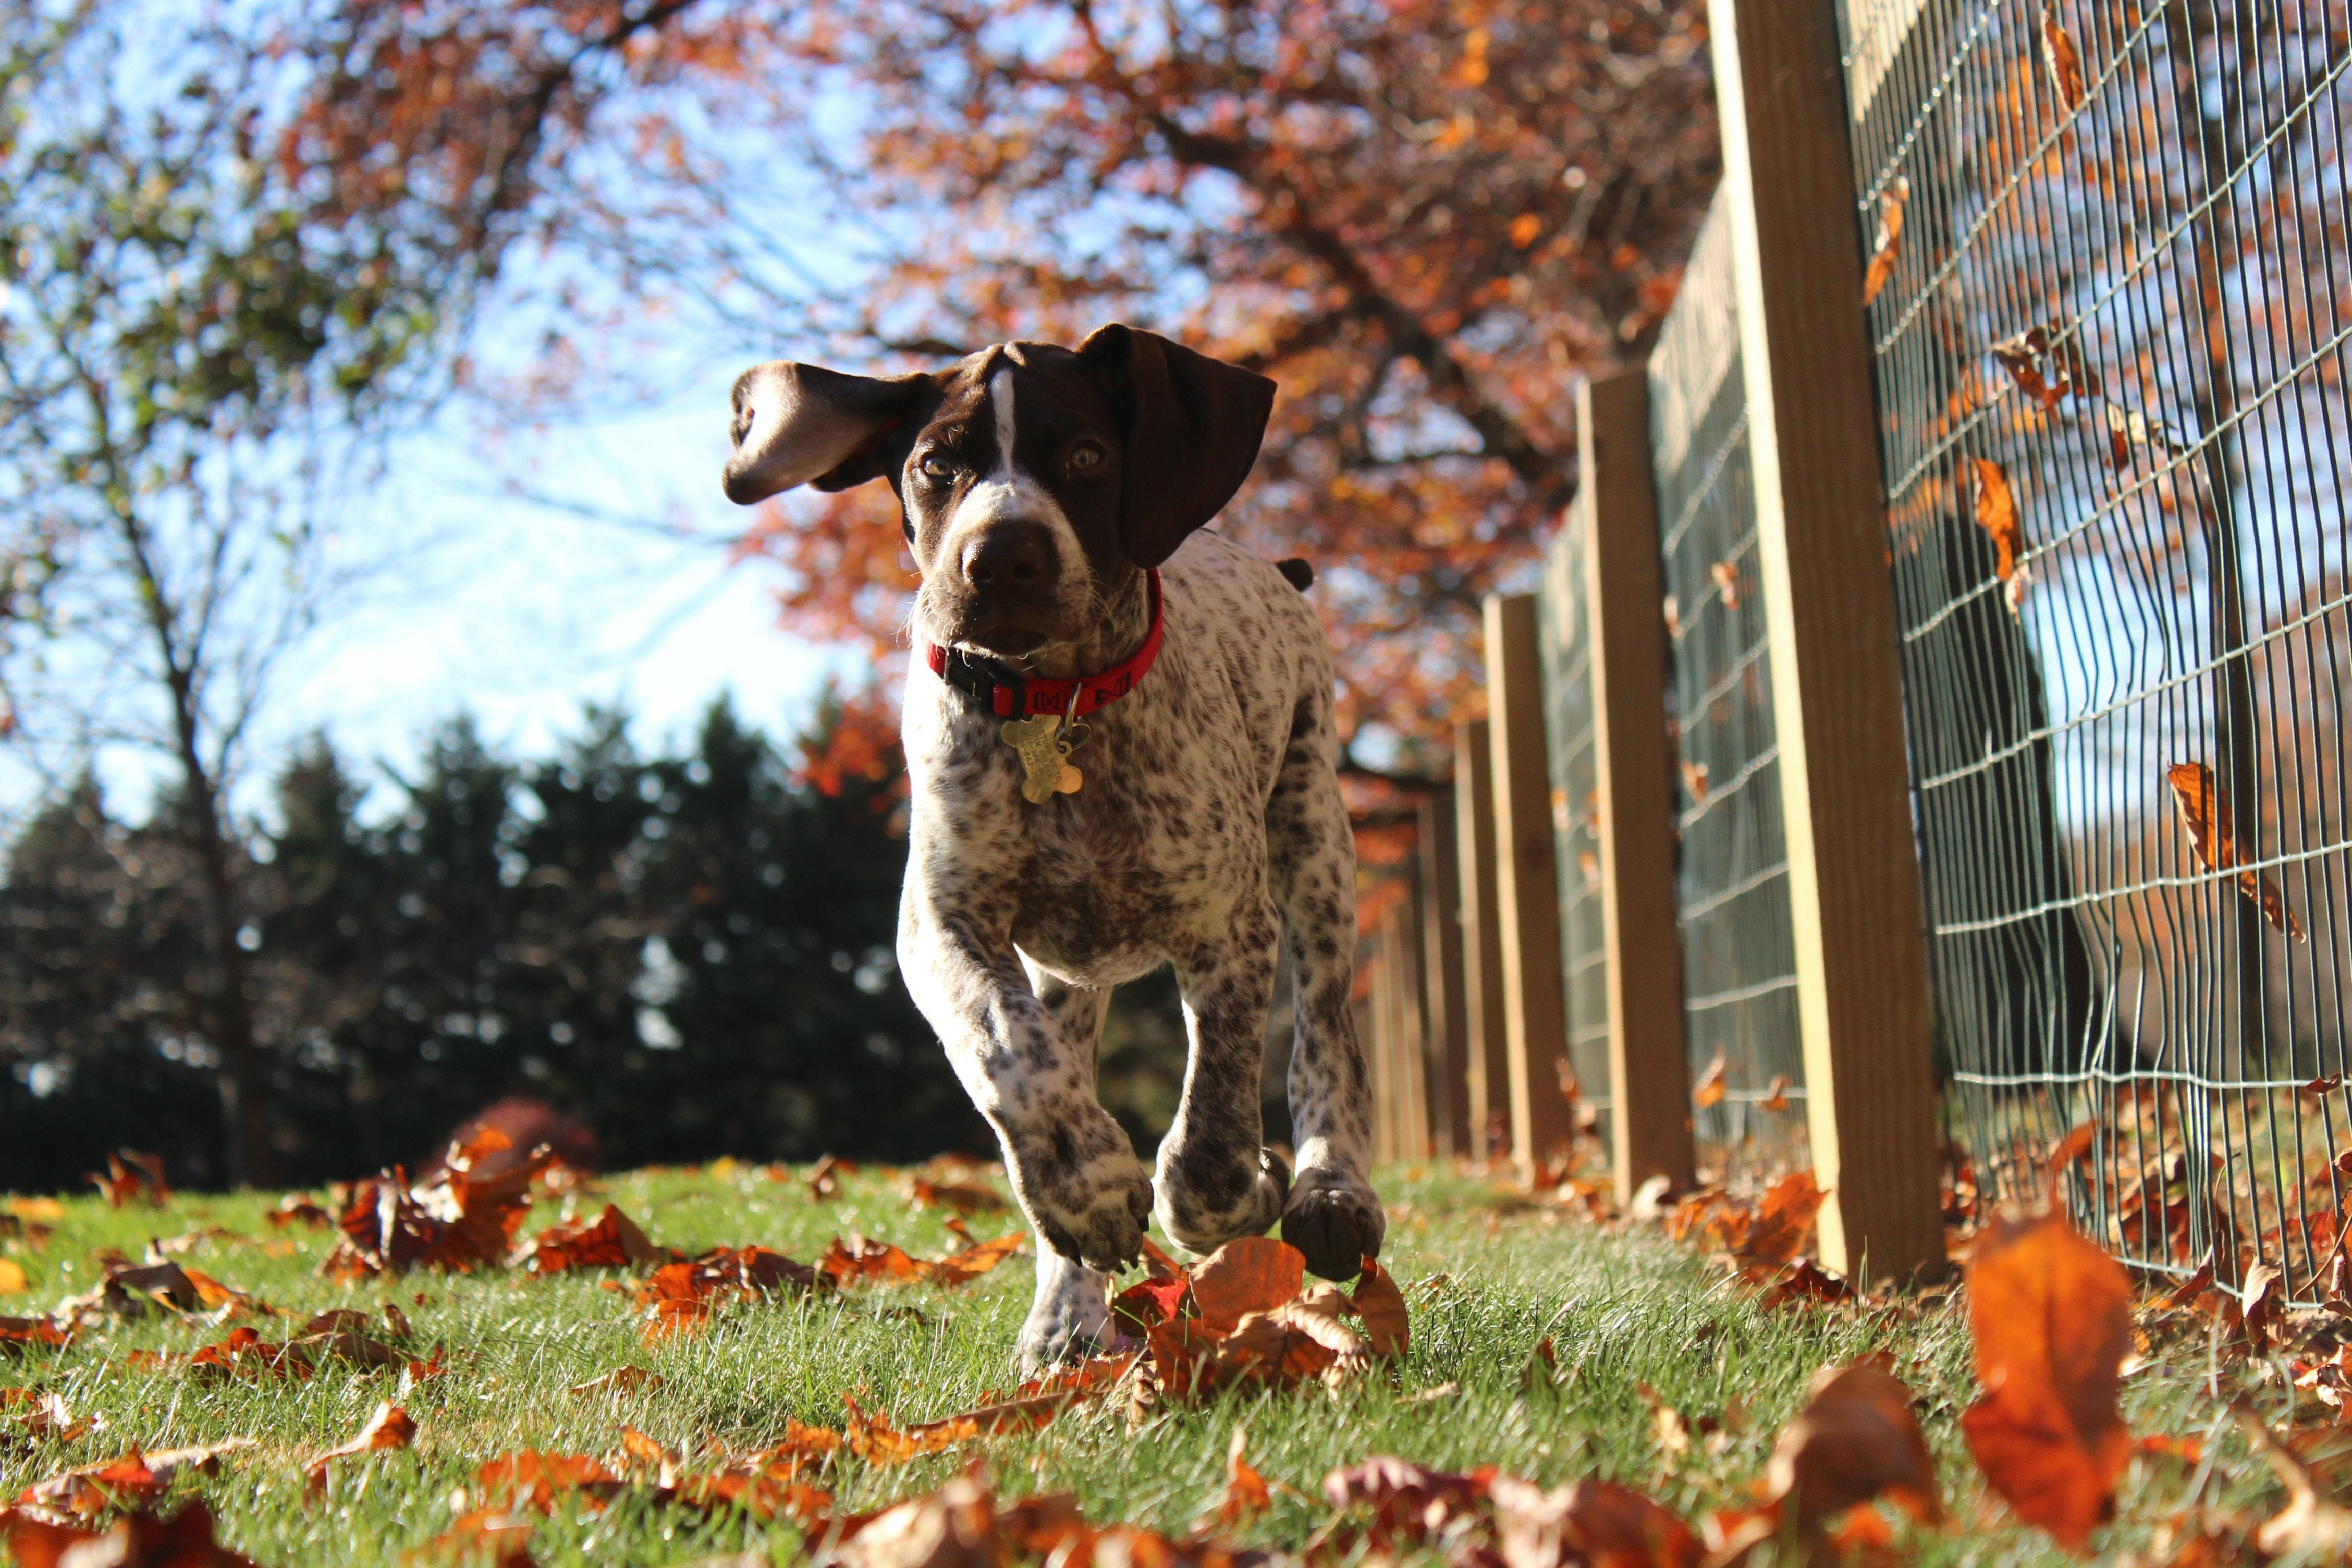 dog running beside a fence